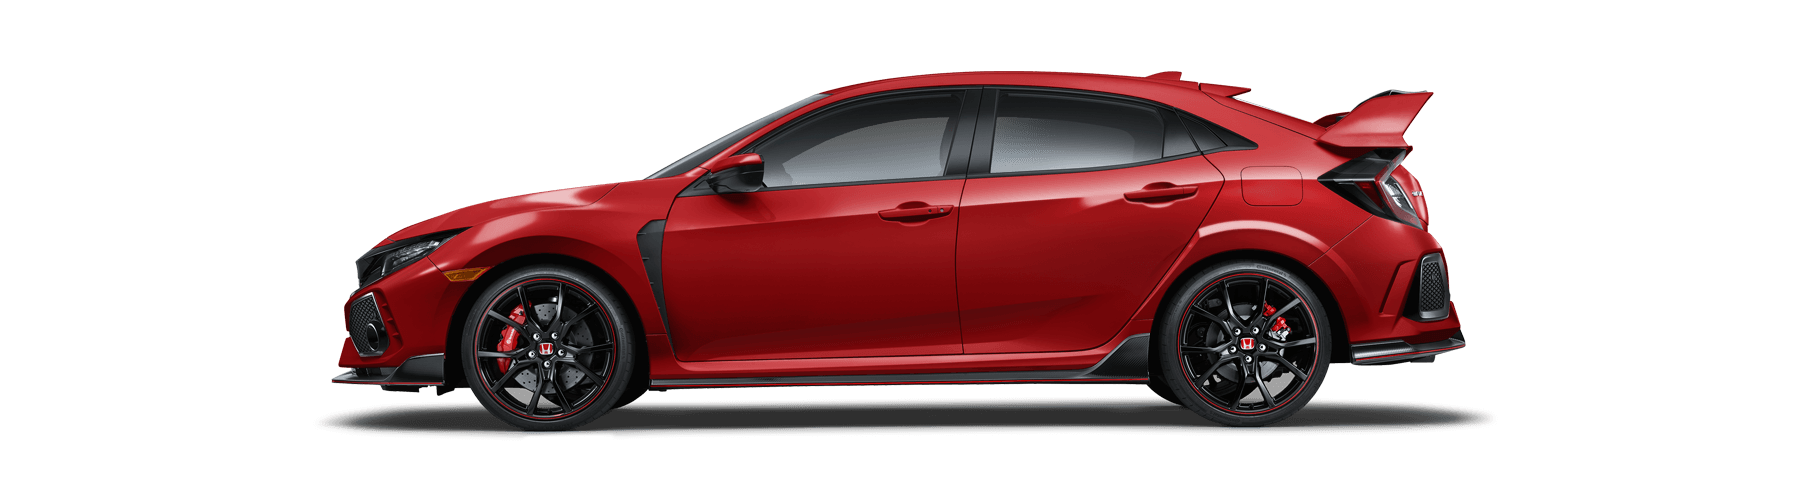 2018 Honda Civic Type R Side Profile